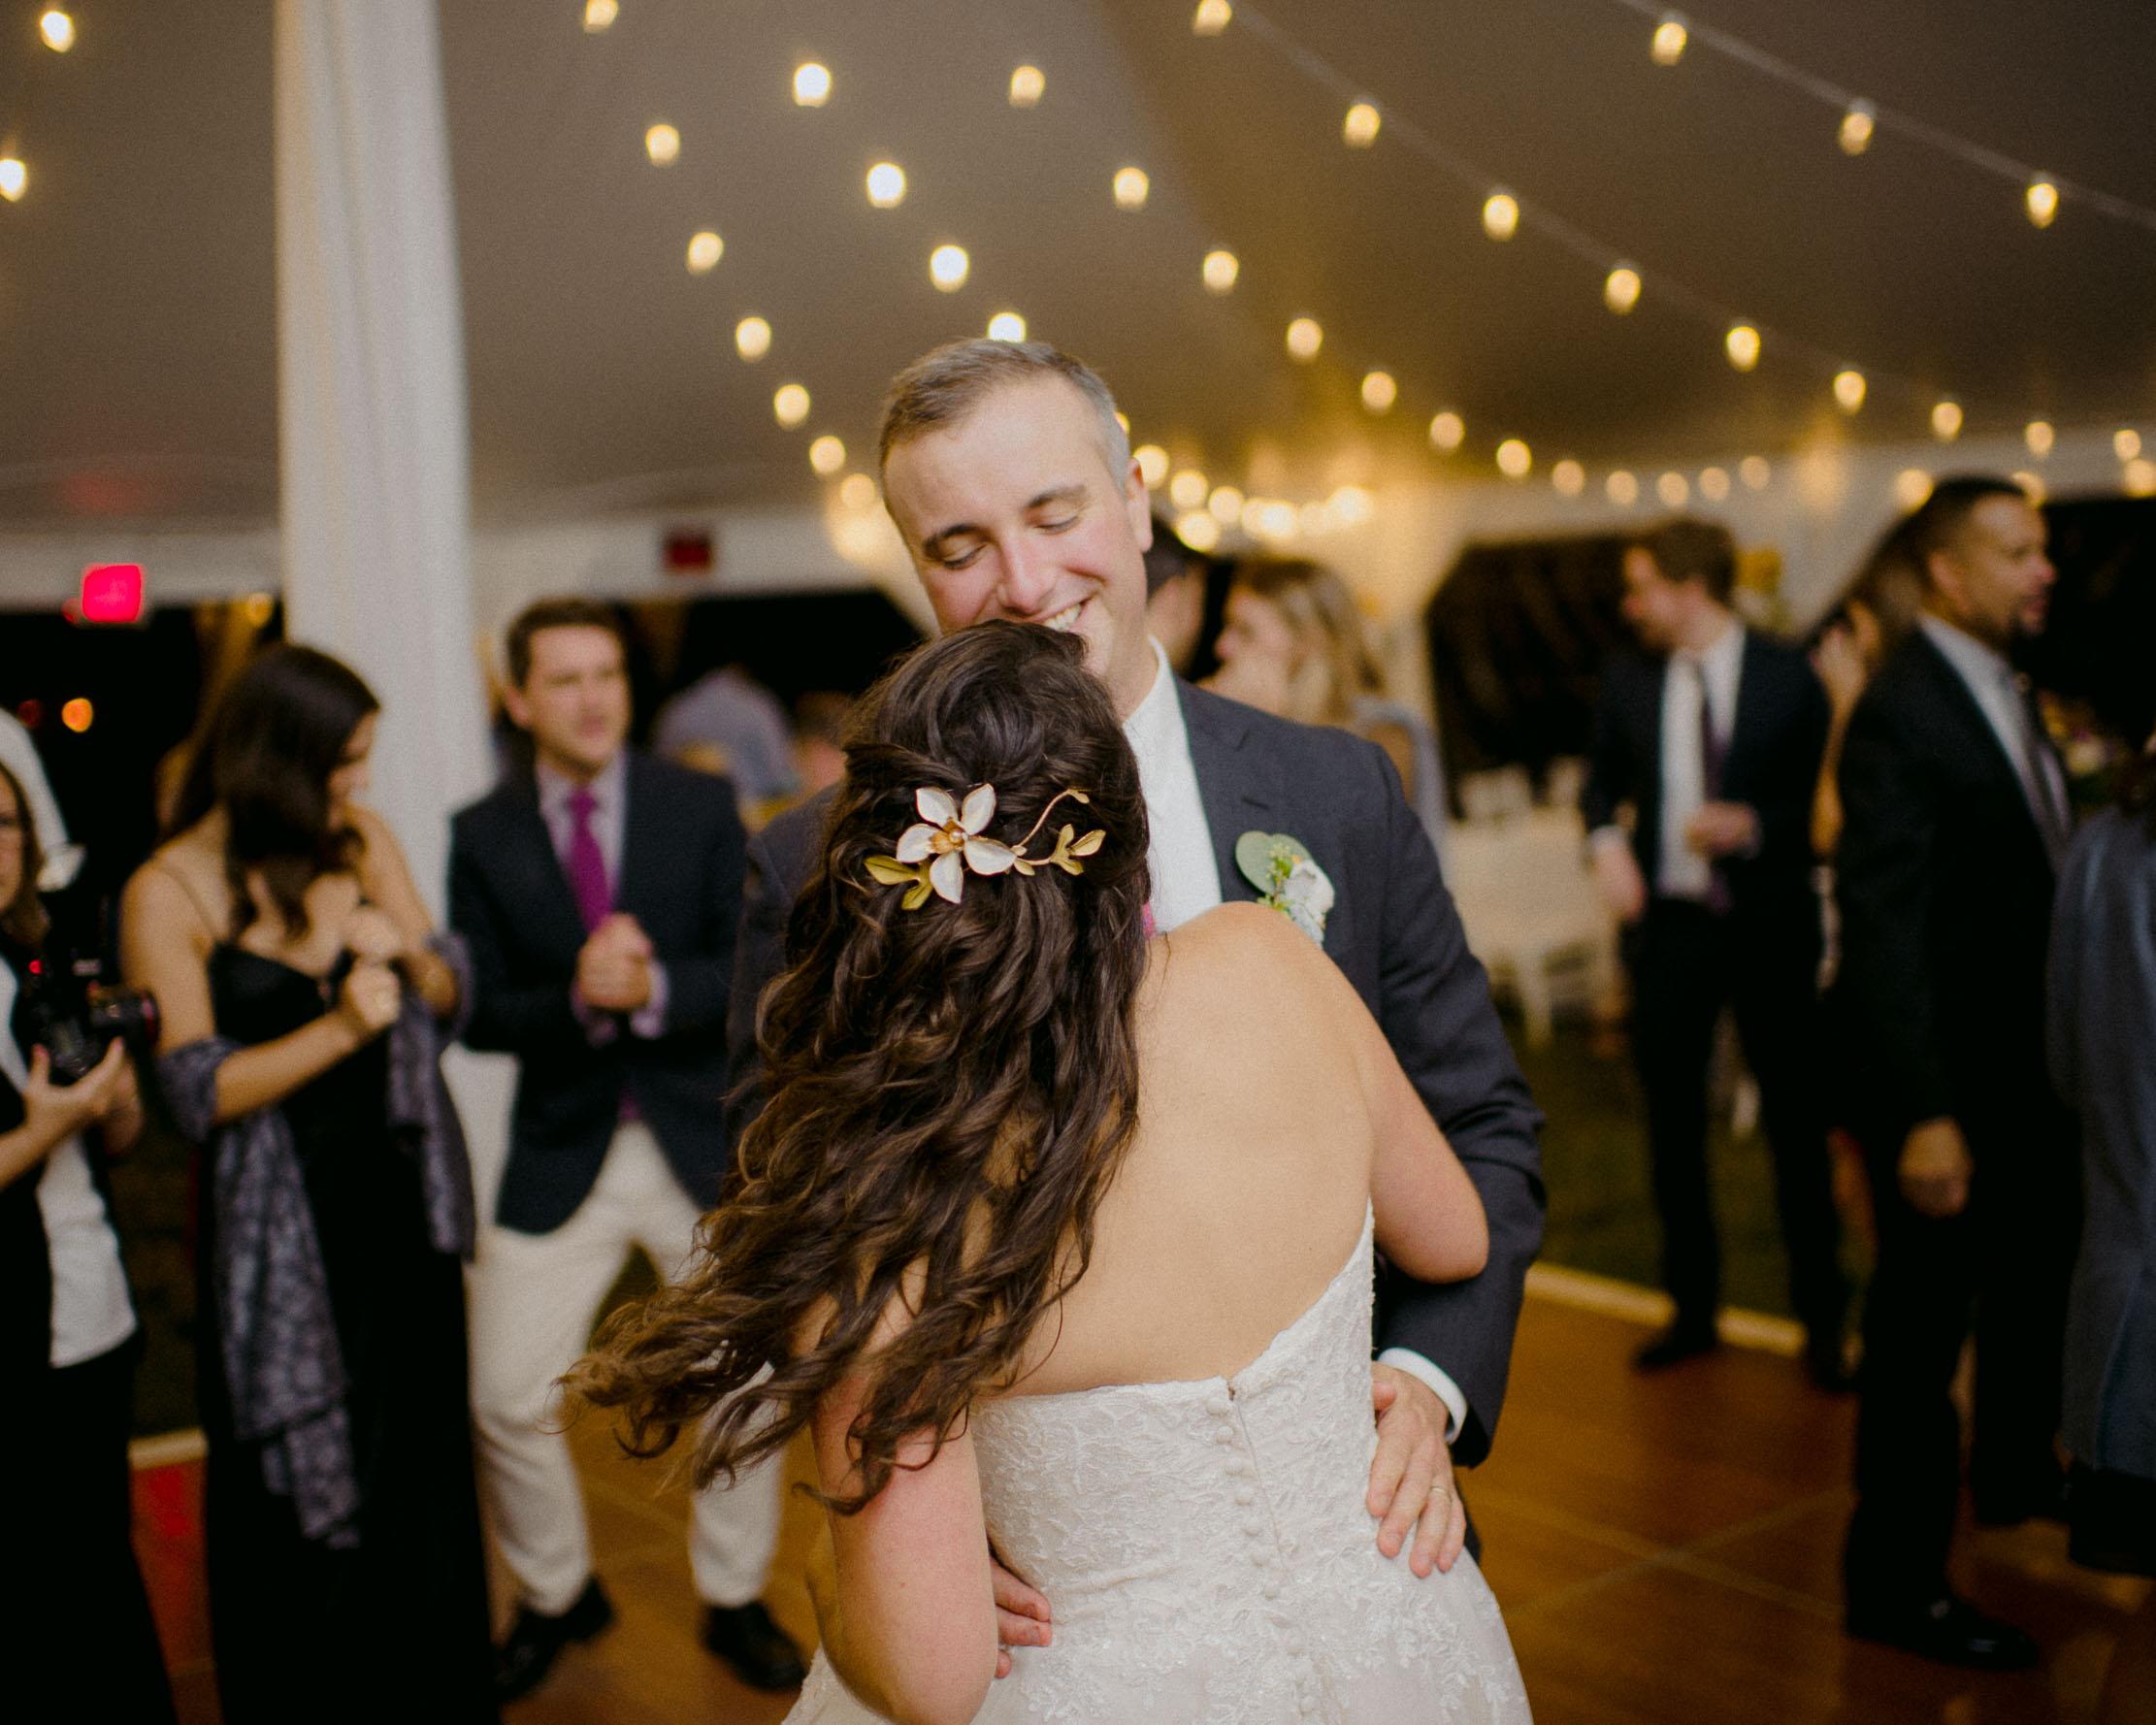 Wings-Castle-Millbrook-NY-Upstate-Wedding-Photographer-1164.jpg